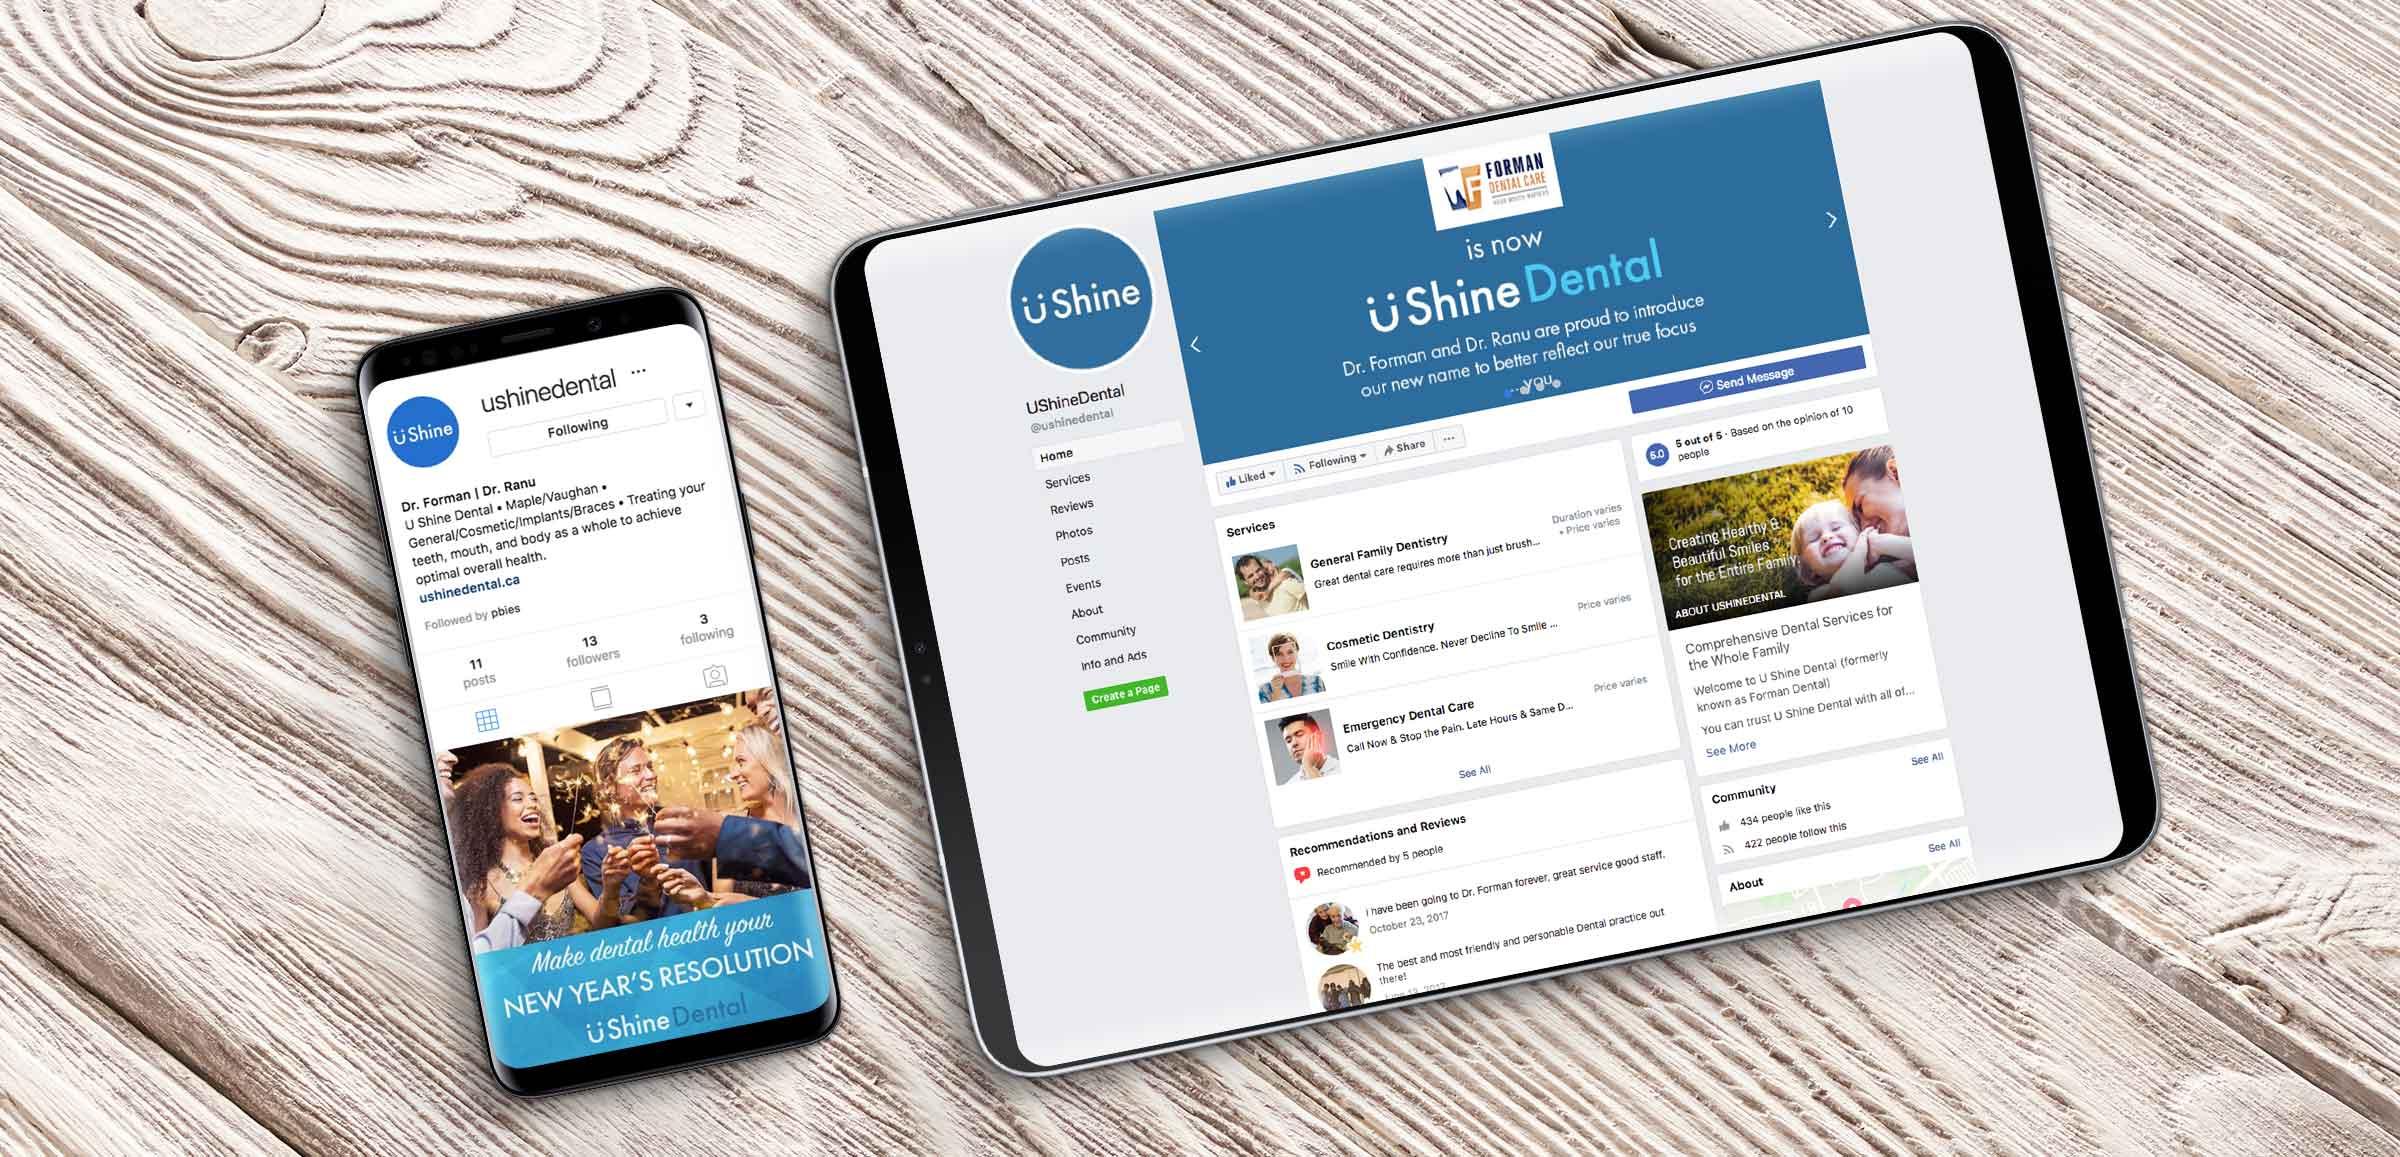 U-shine-dental-social-media